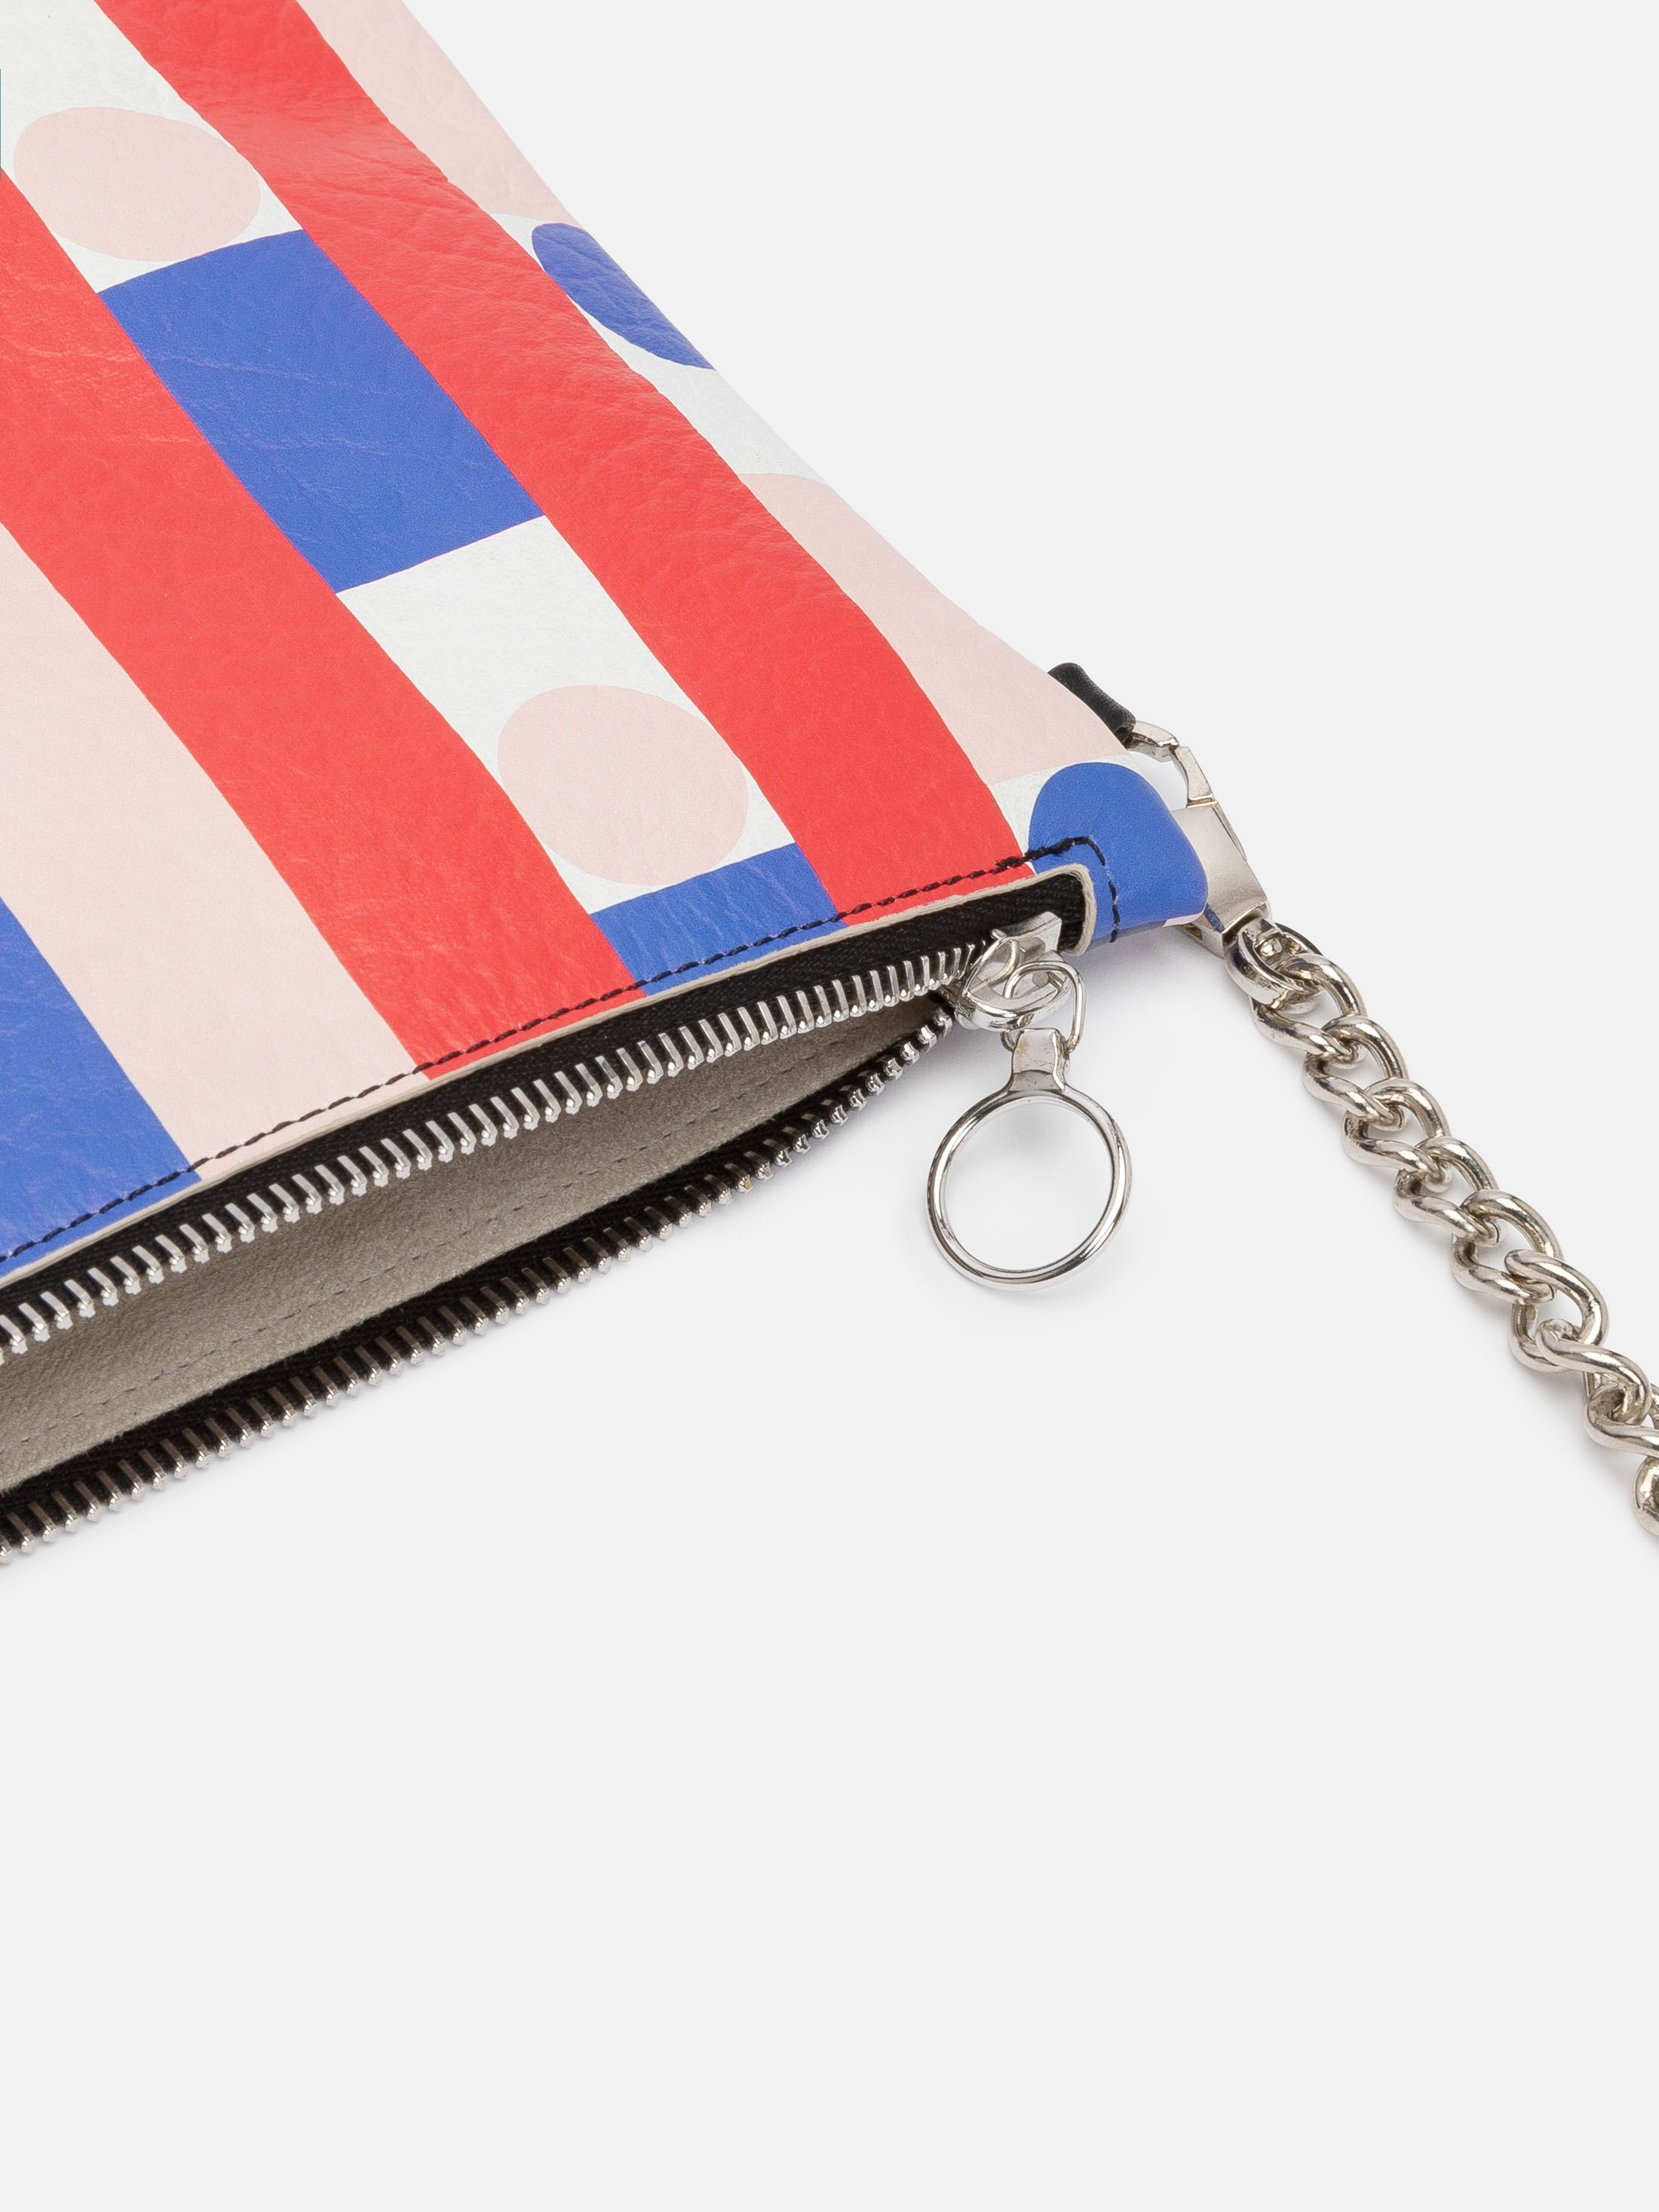 design your own crossbody bag detailing